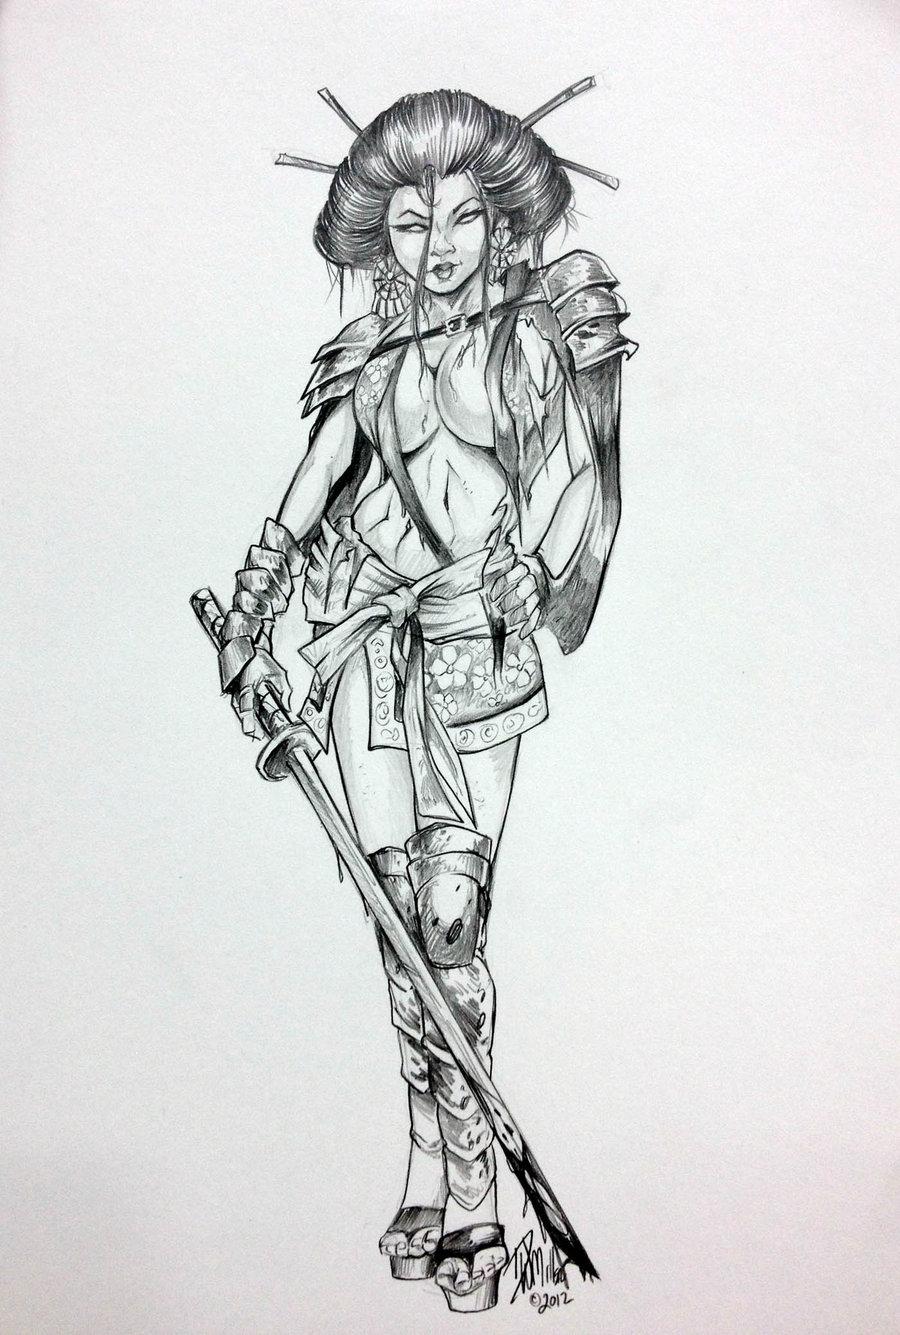 Drawn warrior line art Geisha ConceptsByMiller  Girl DW